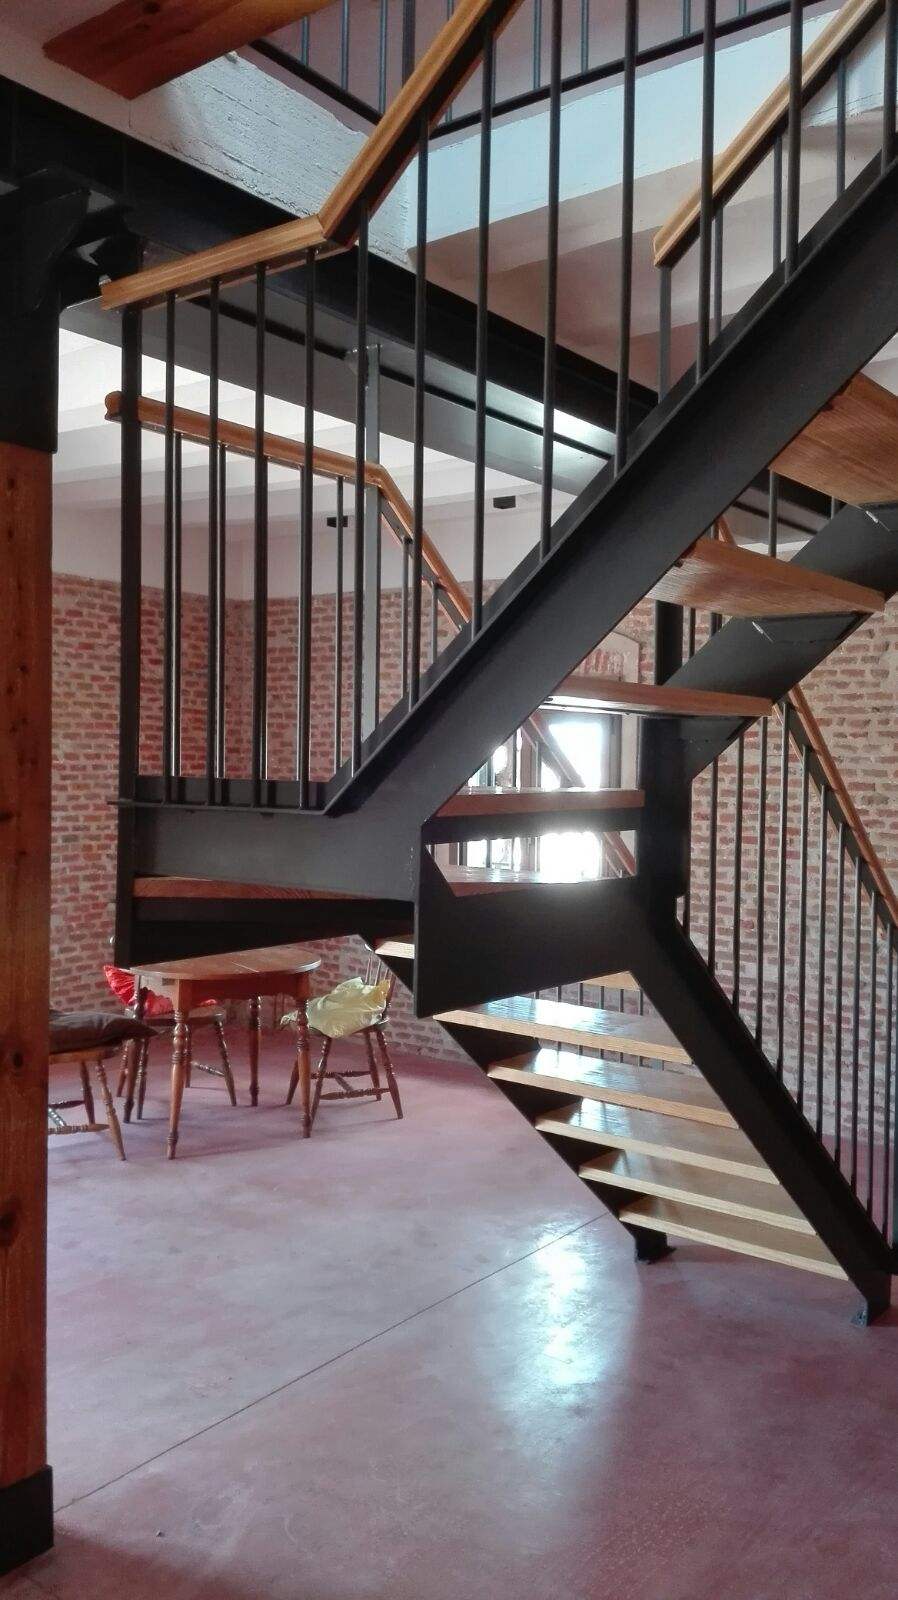 Fabricación de escaleras: Servicios del Taller de Talleres Franco Cobos